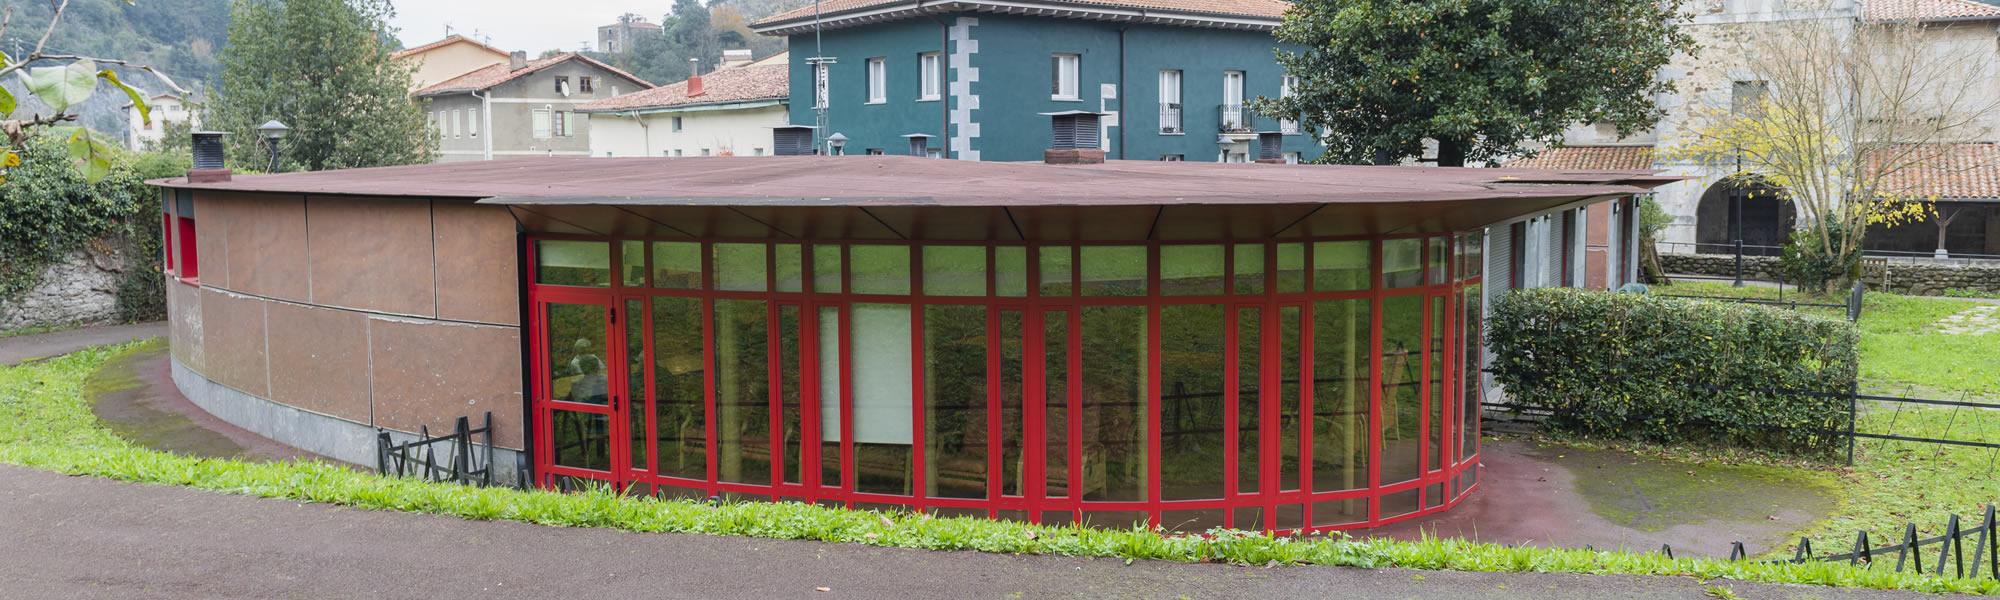 Zurekin centro para mayores - Vista del exterior